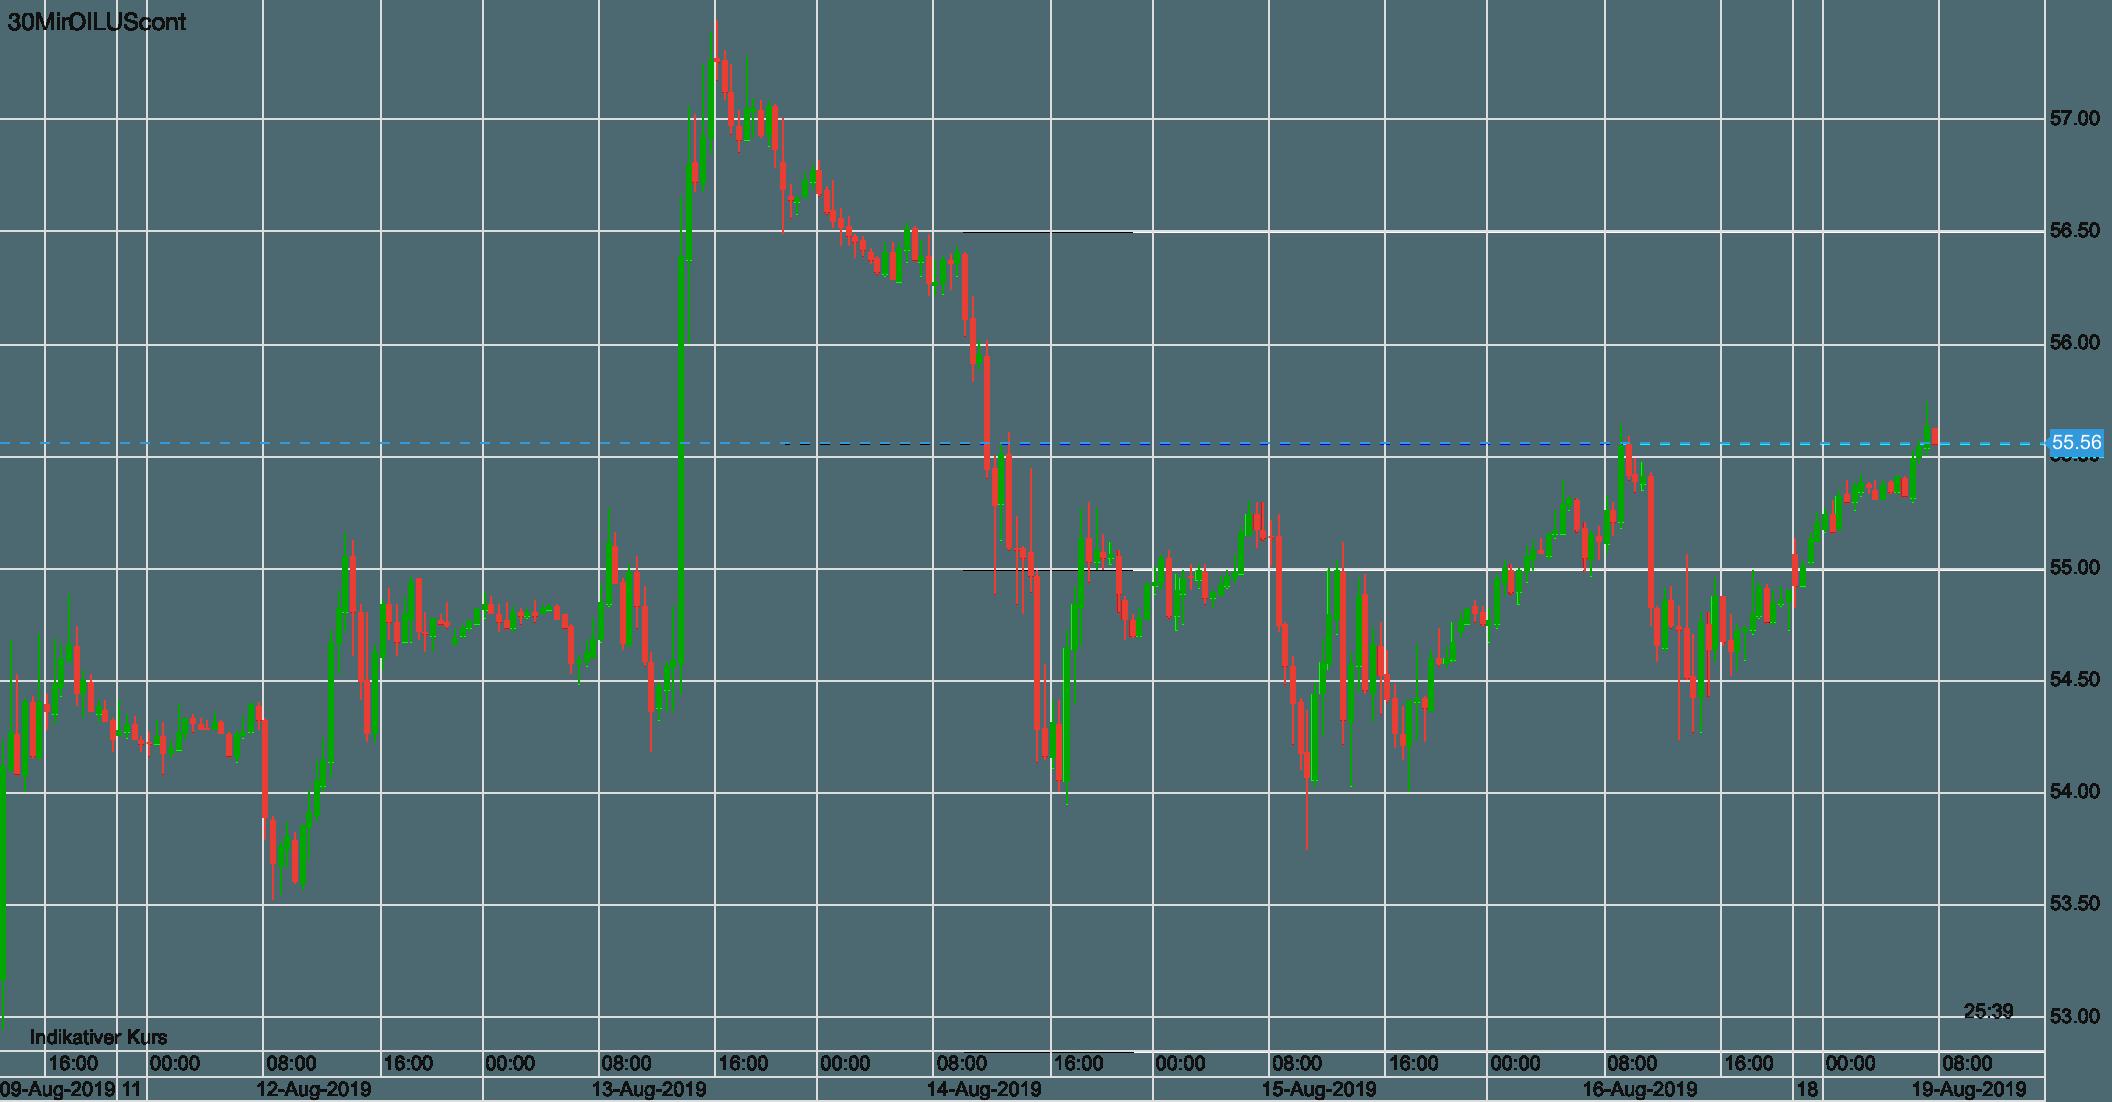 Ölpreis WTI seit 9. August